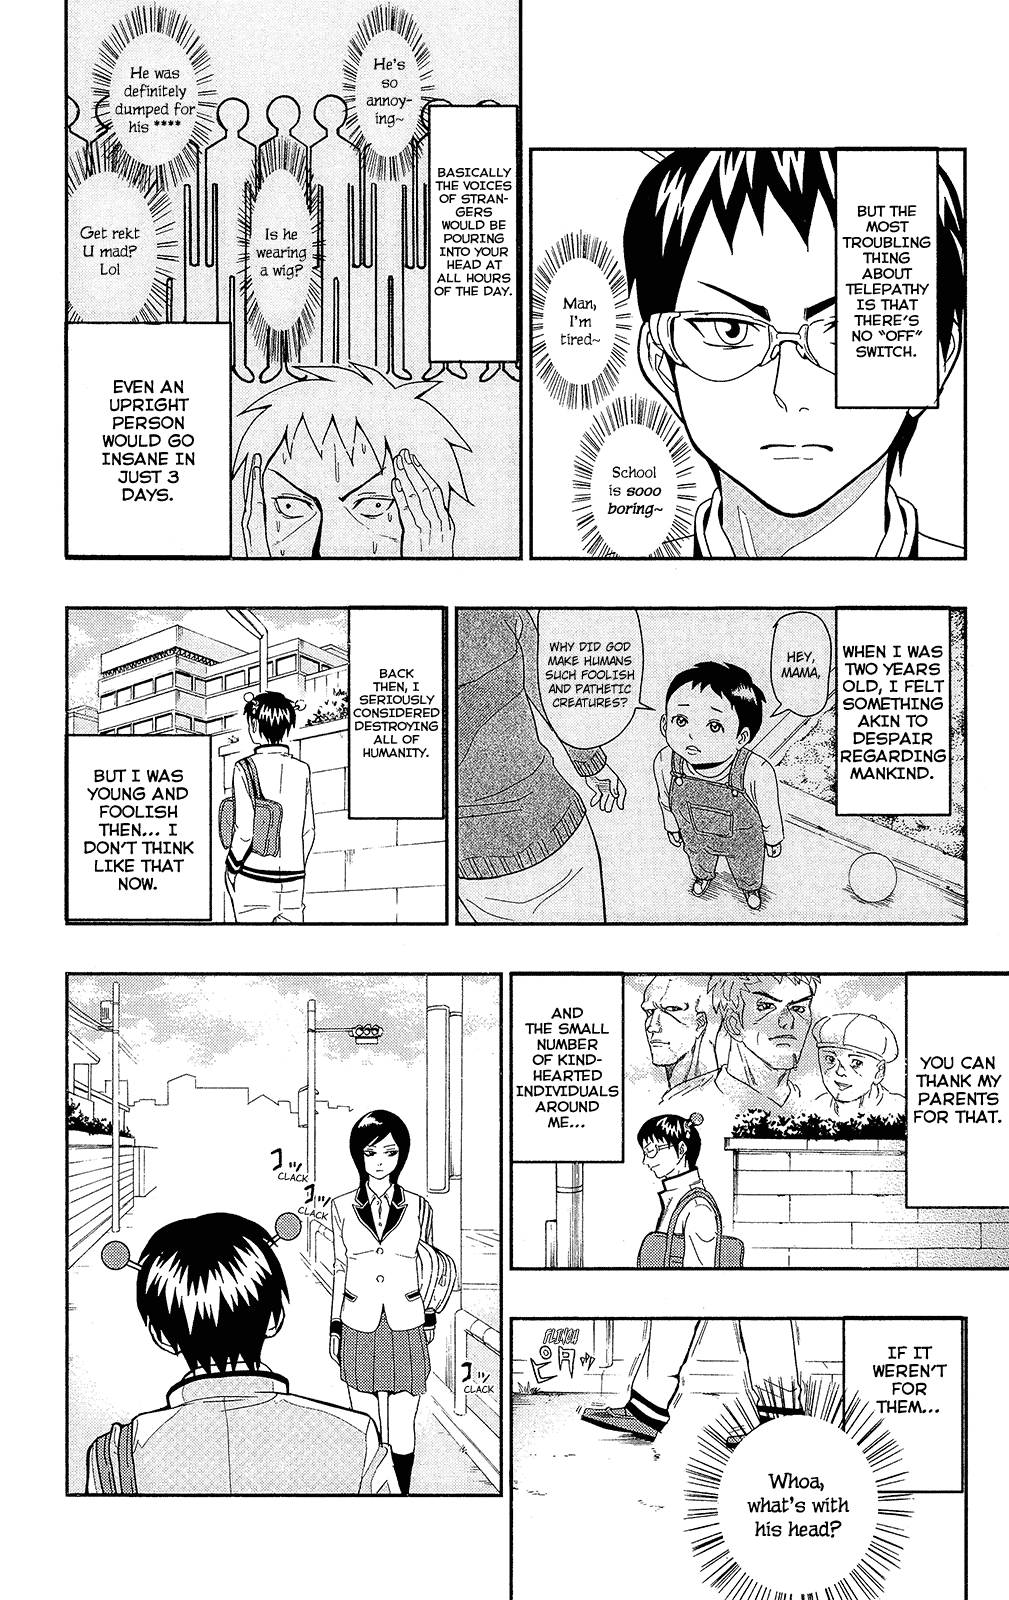 Манга - Manga - Saiki Kusuo no Psi Nan - Ох, уж этот экстрасенс Сайки Кусуо